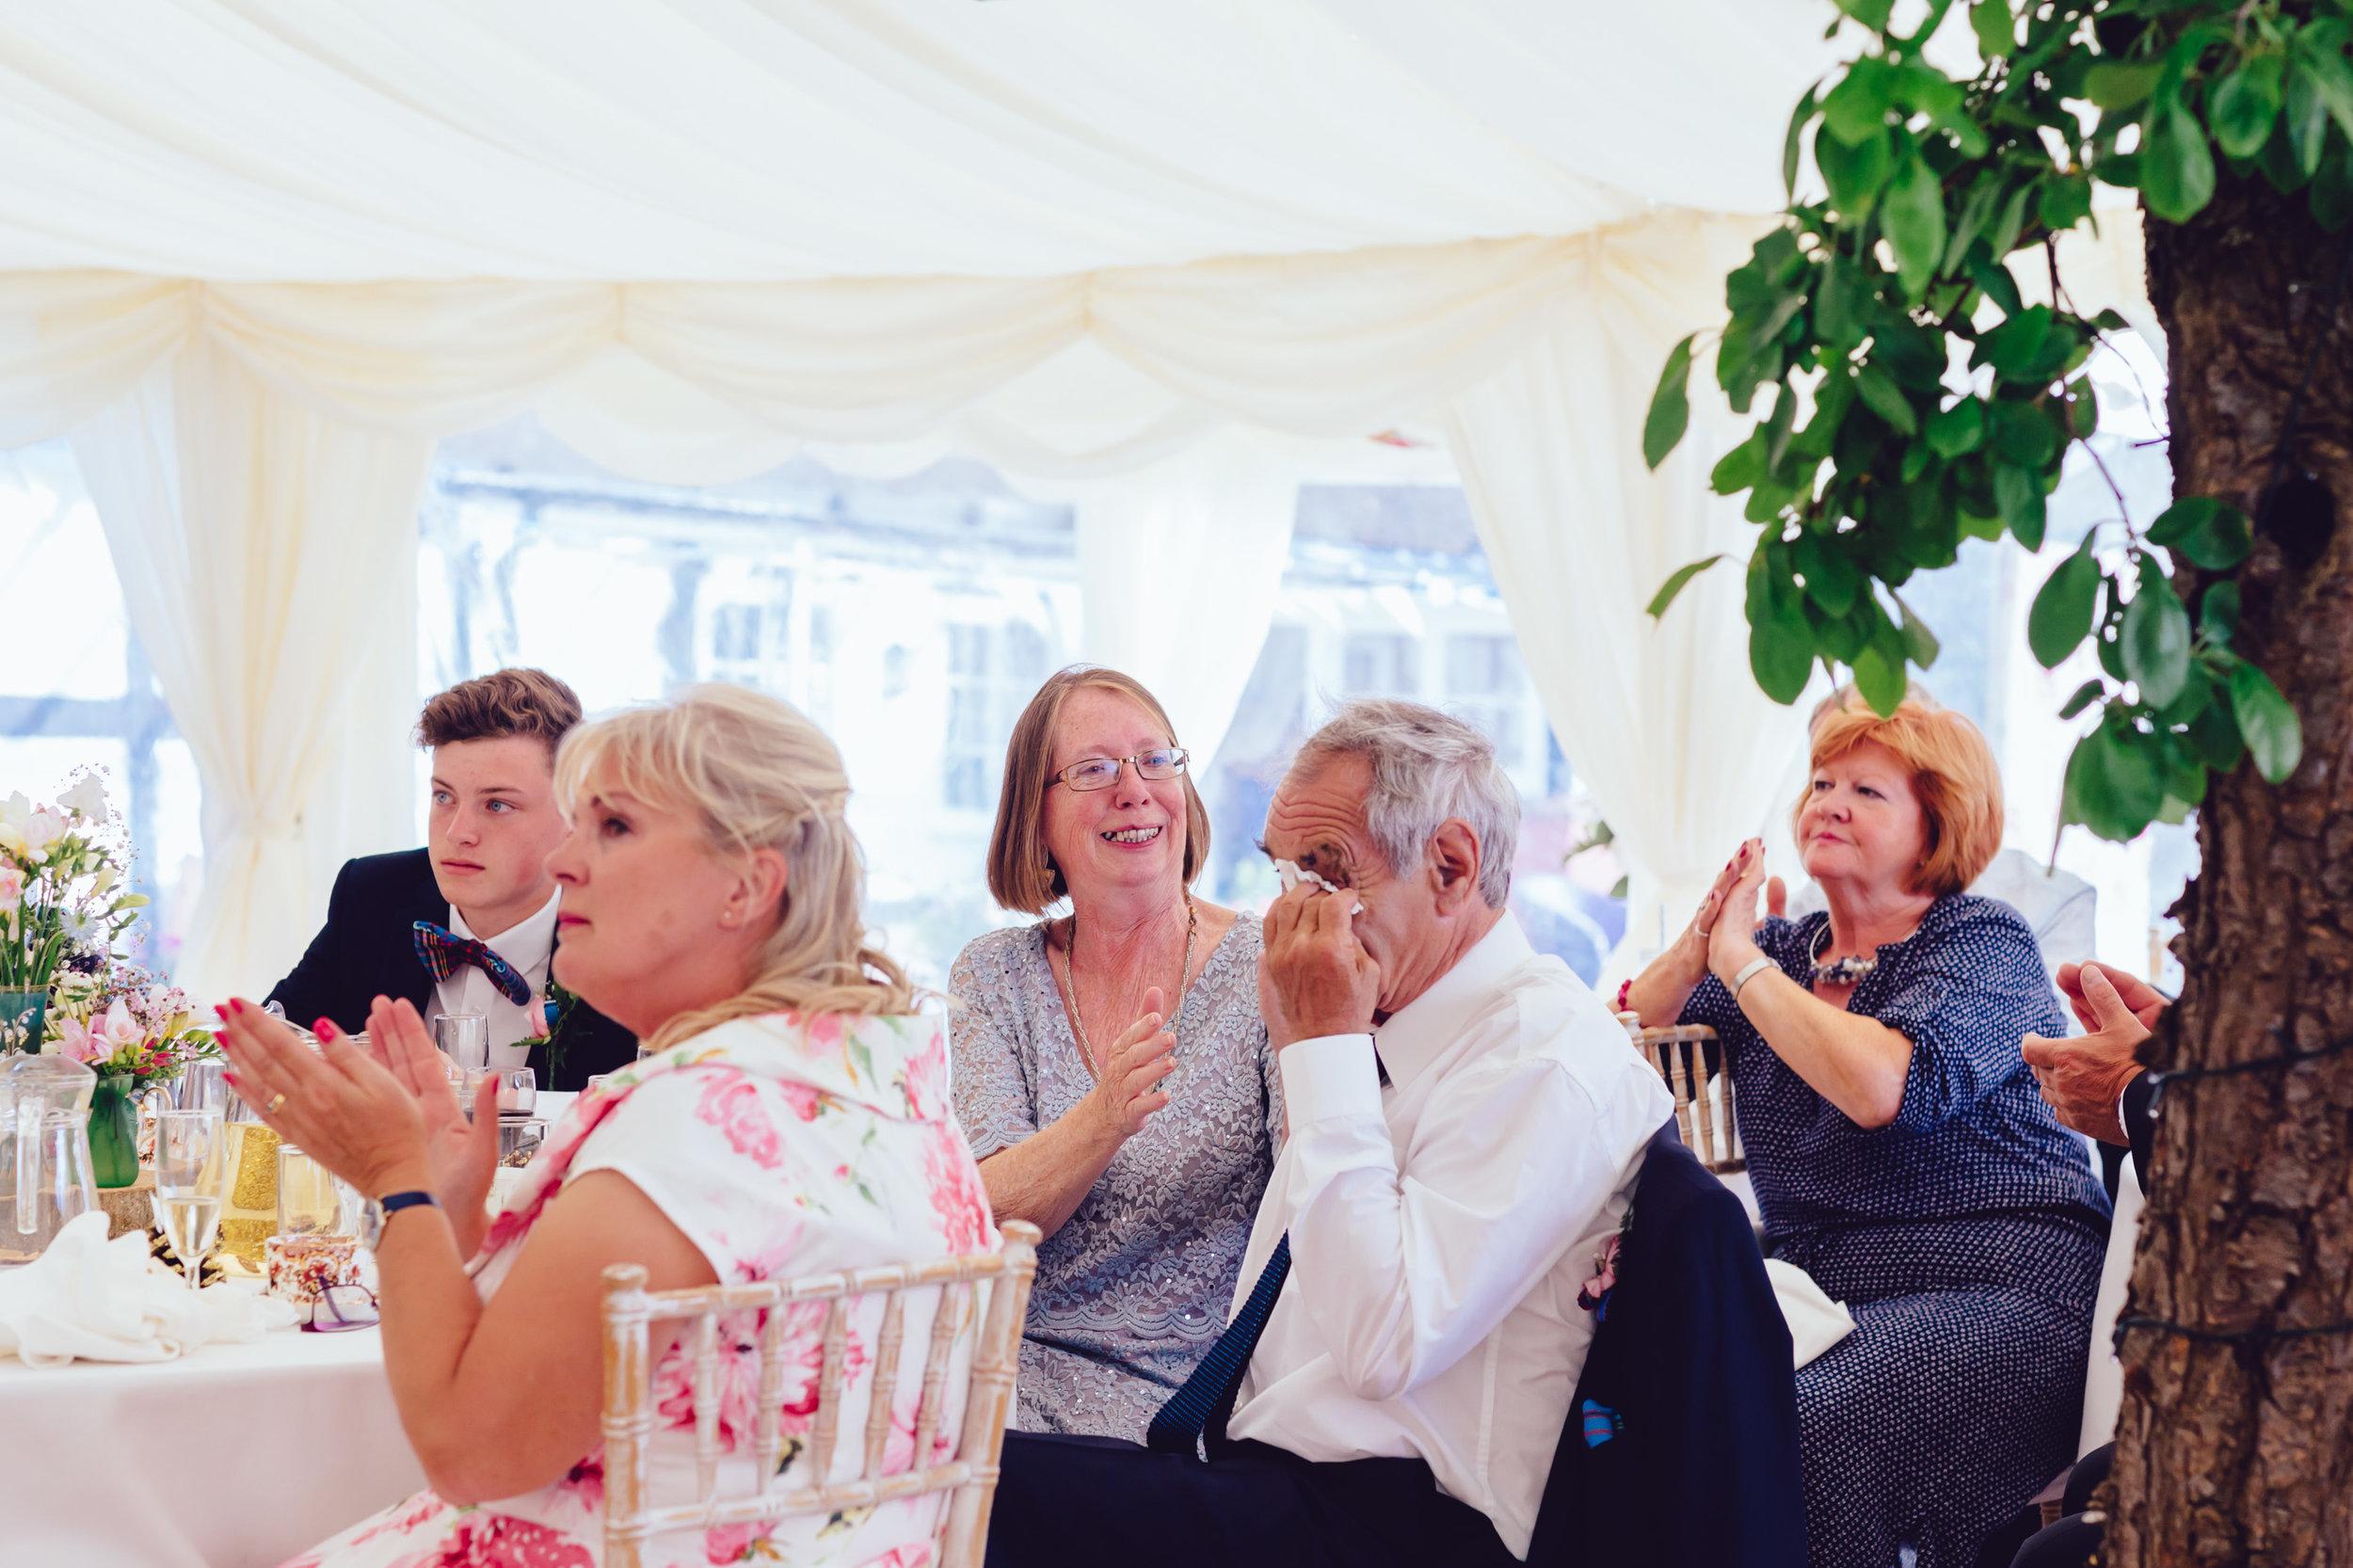 Birmingham photographer wedding country artistic wedding photography54.jpg